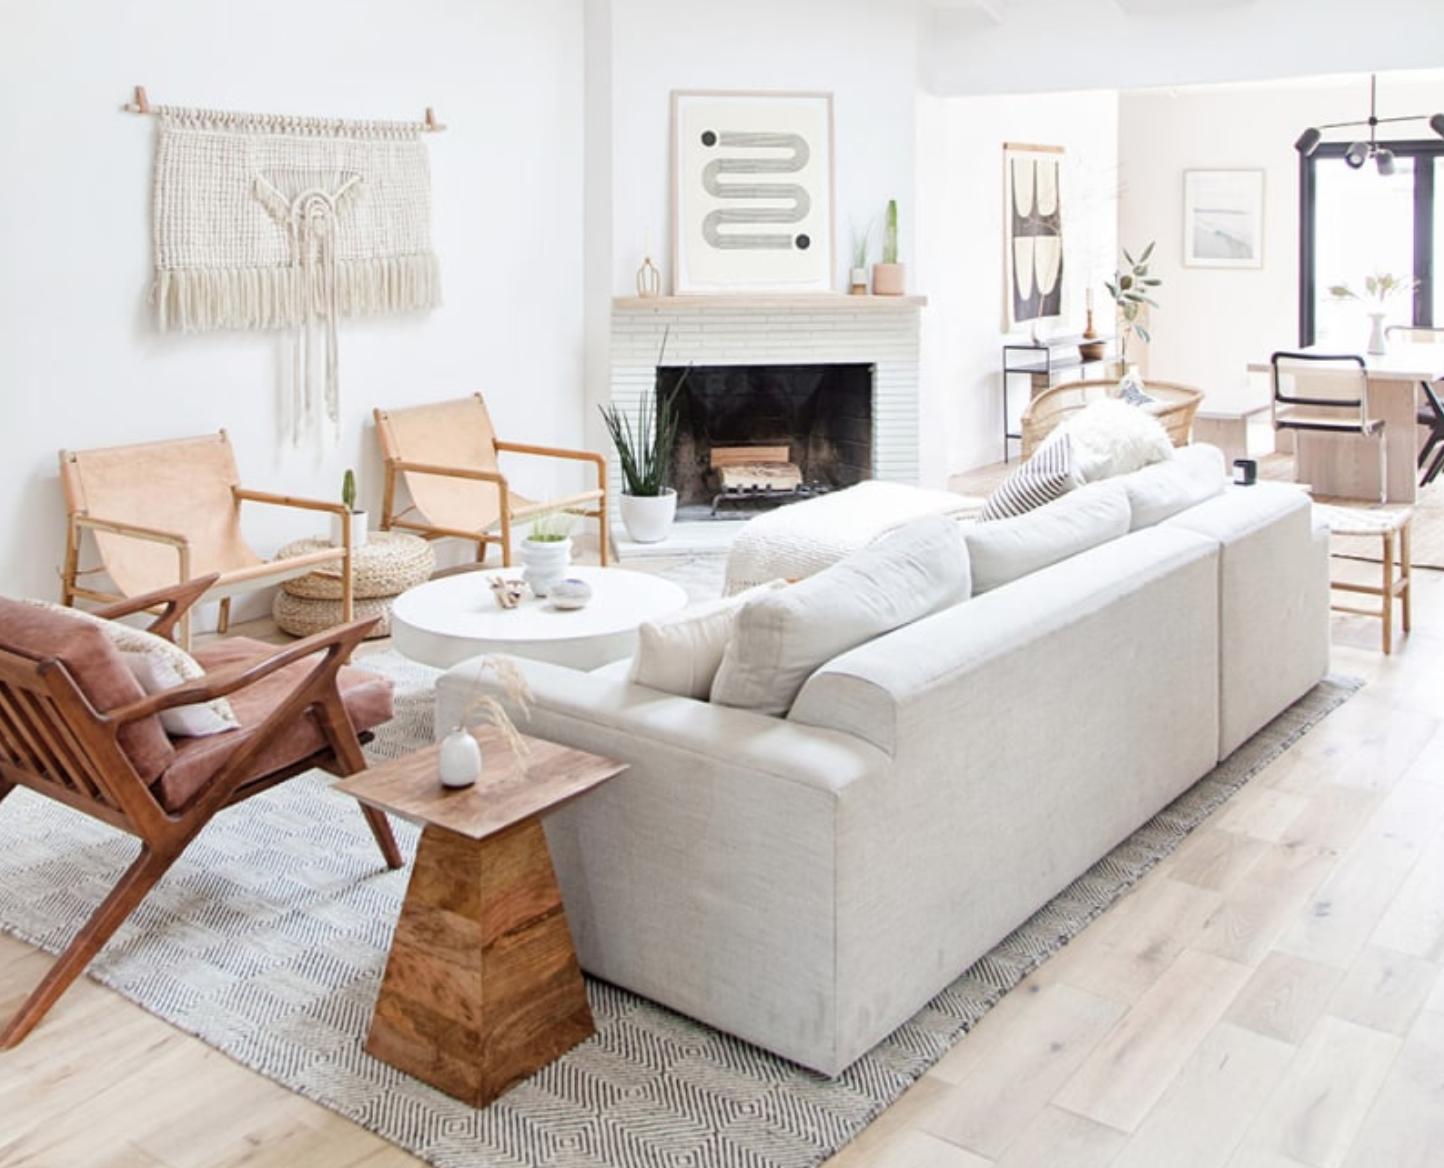 amanda dawbarn living room, Neutral Bohemian Styling, warm minimalism